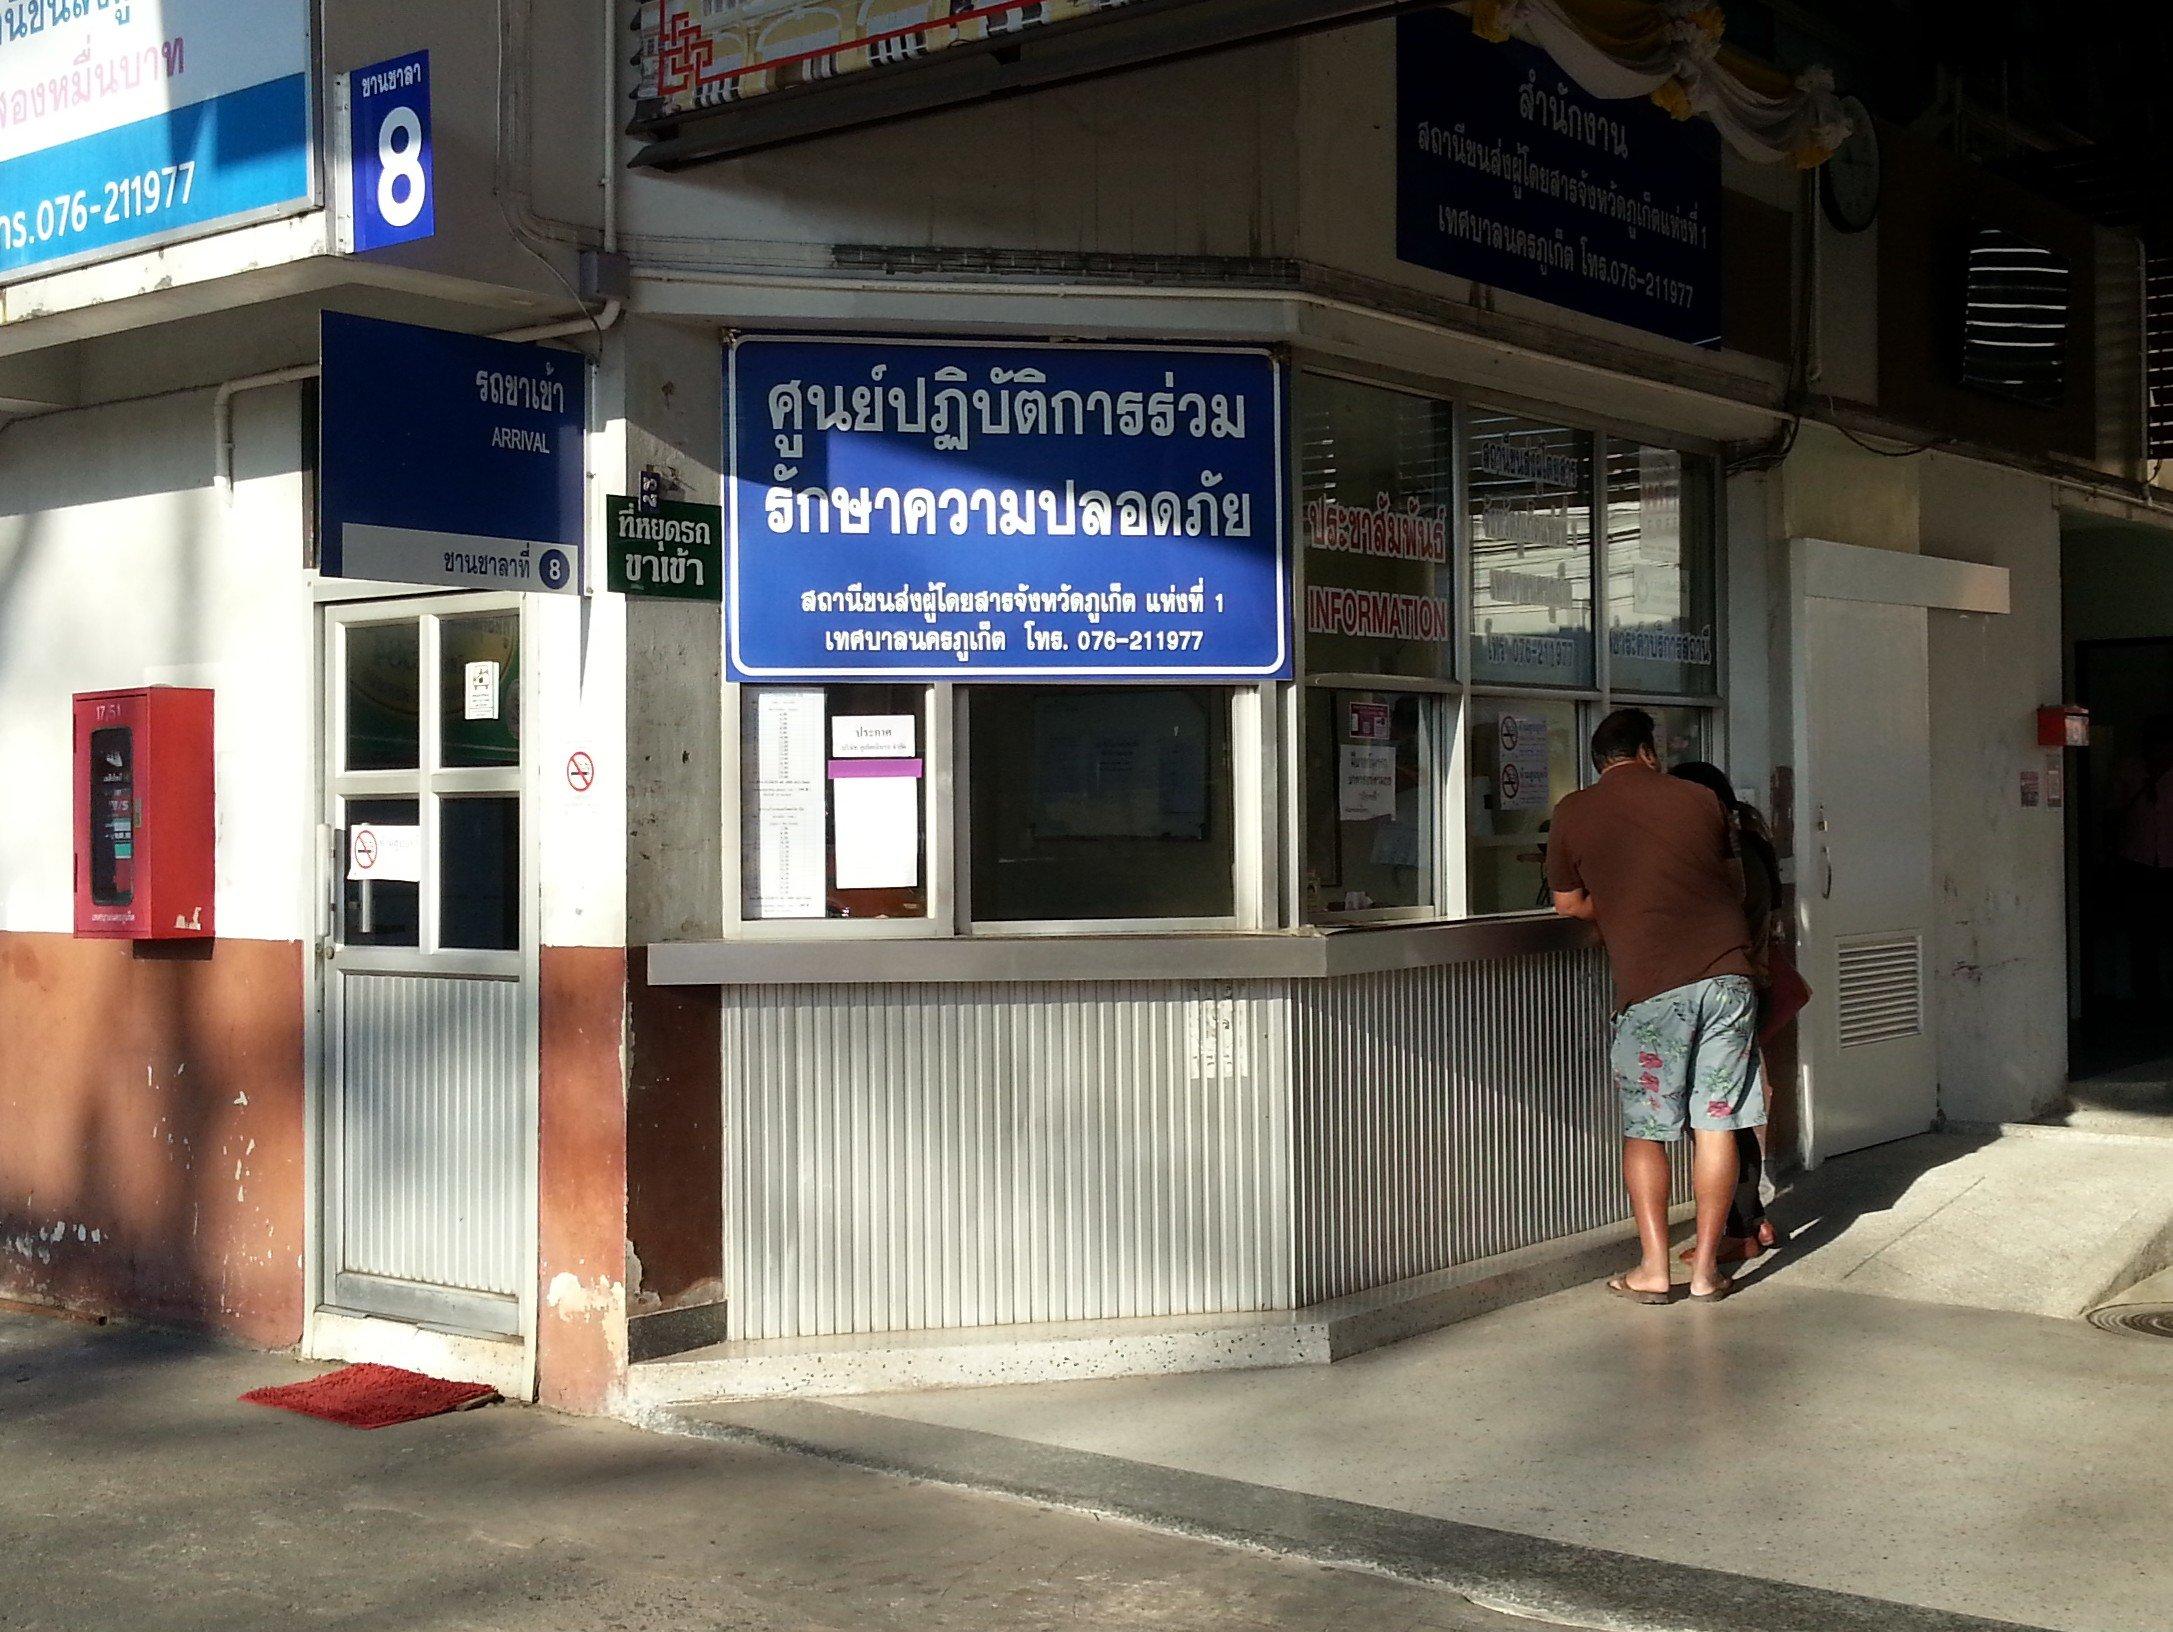 Ticket counter at Phuket Bus Terminal 1